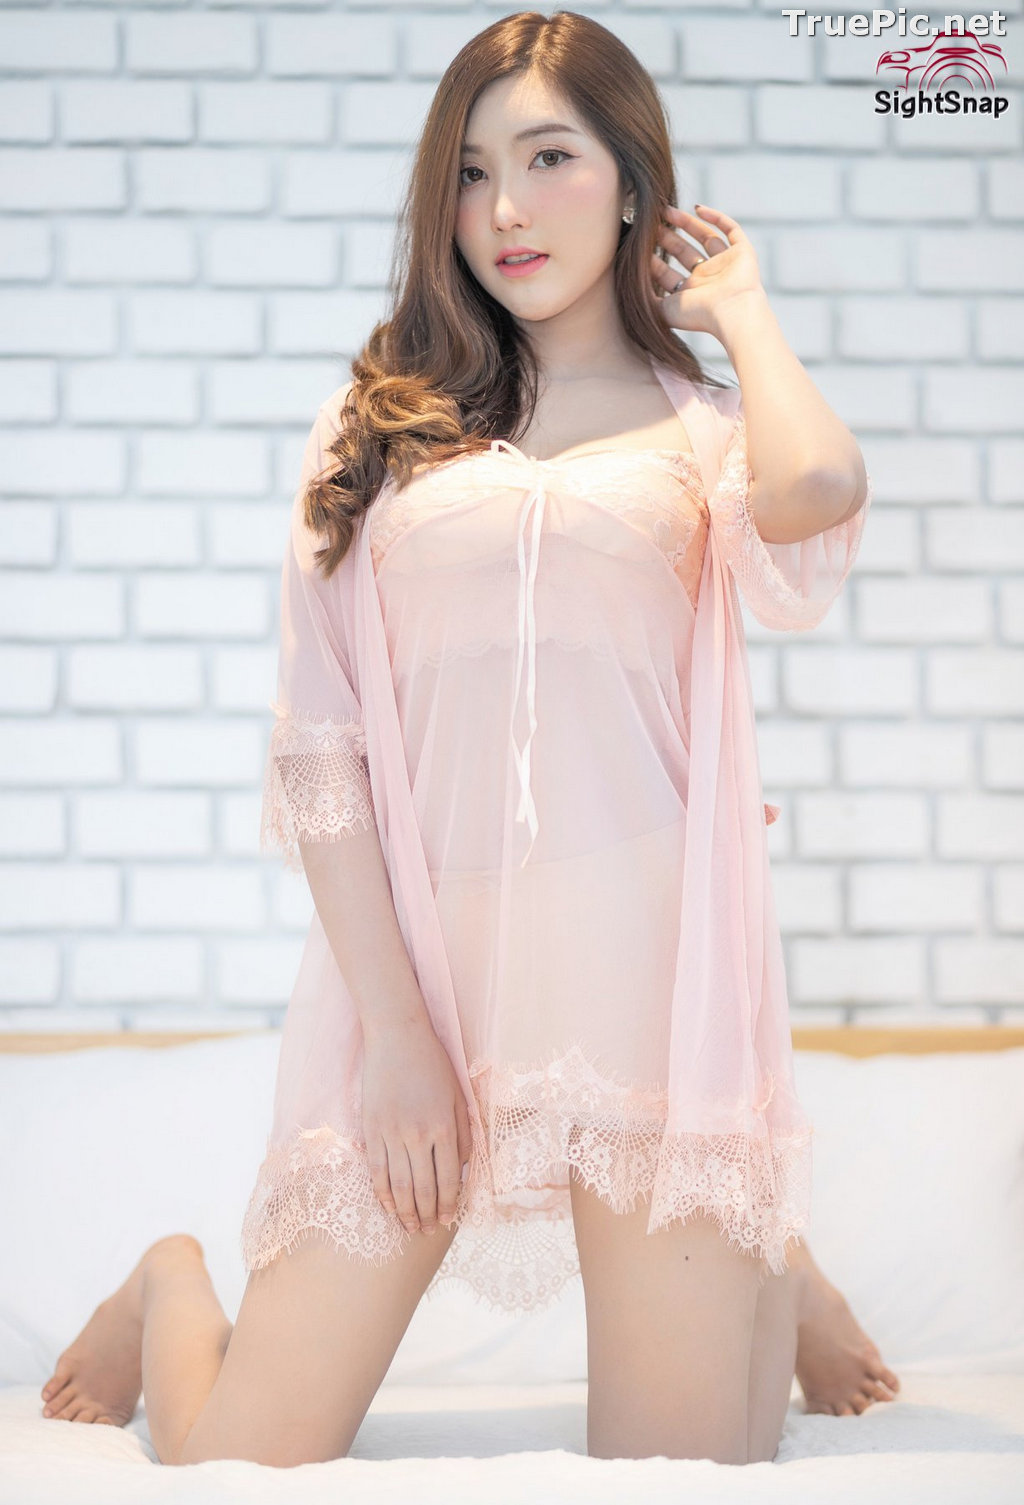 Image Thailand Model - Luc Kie - Nice Pink Love Night Dress - TruePic.net - Picture-2